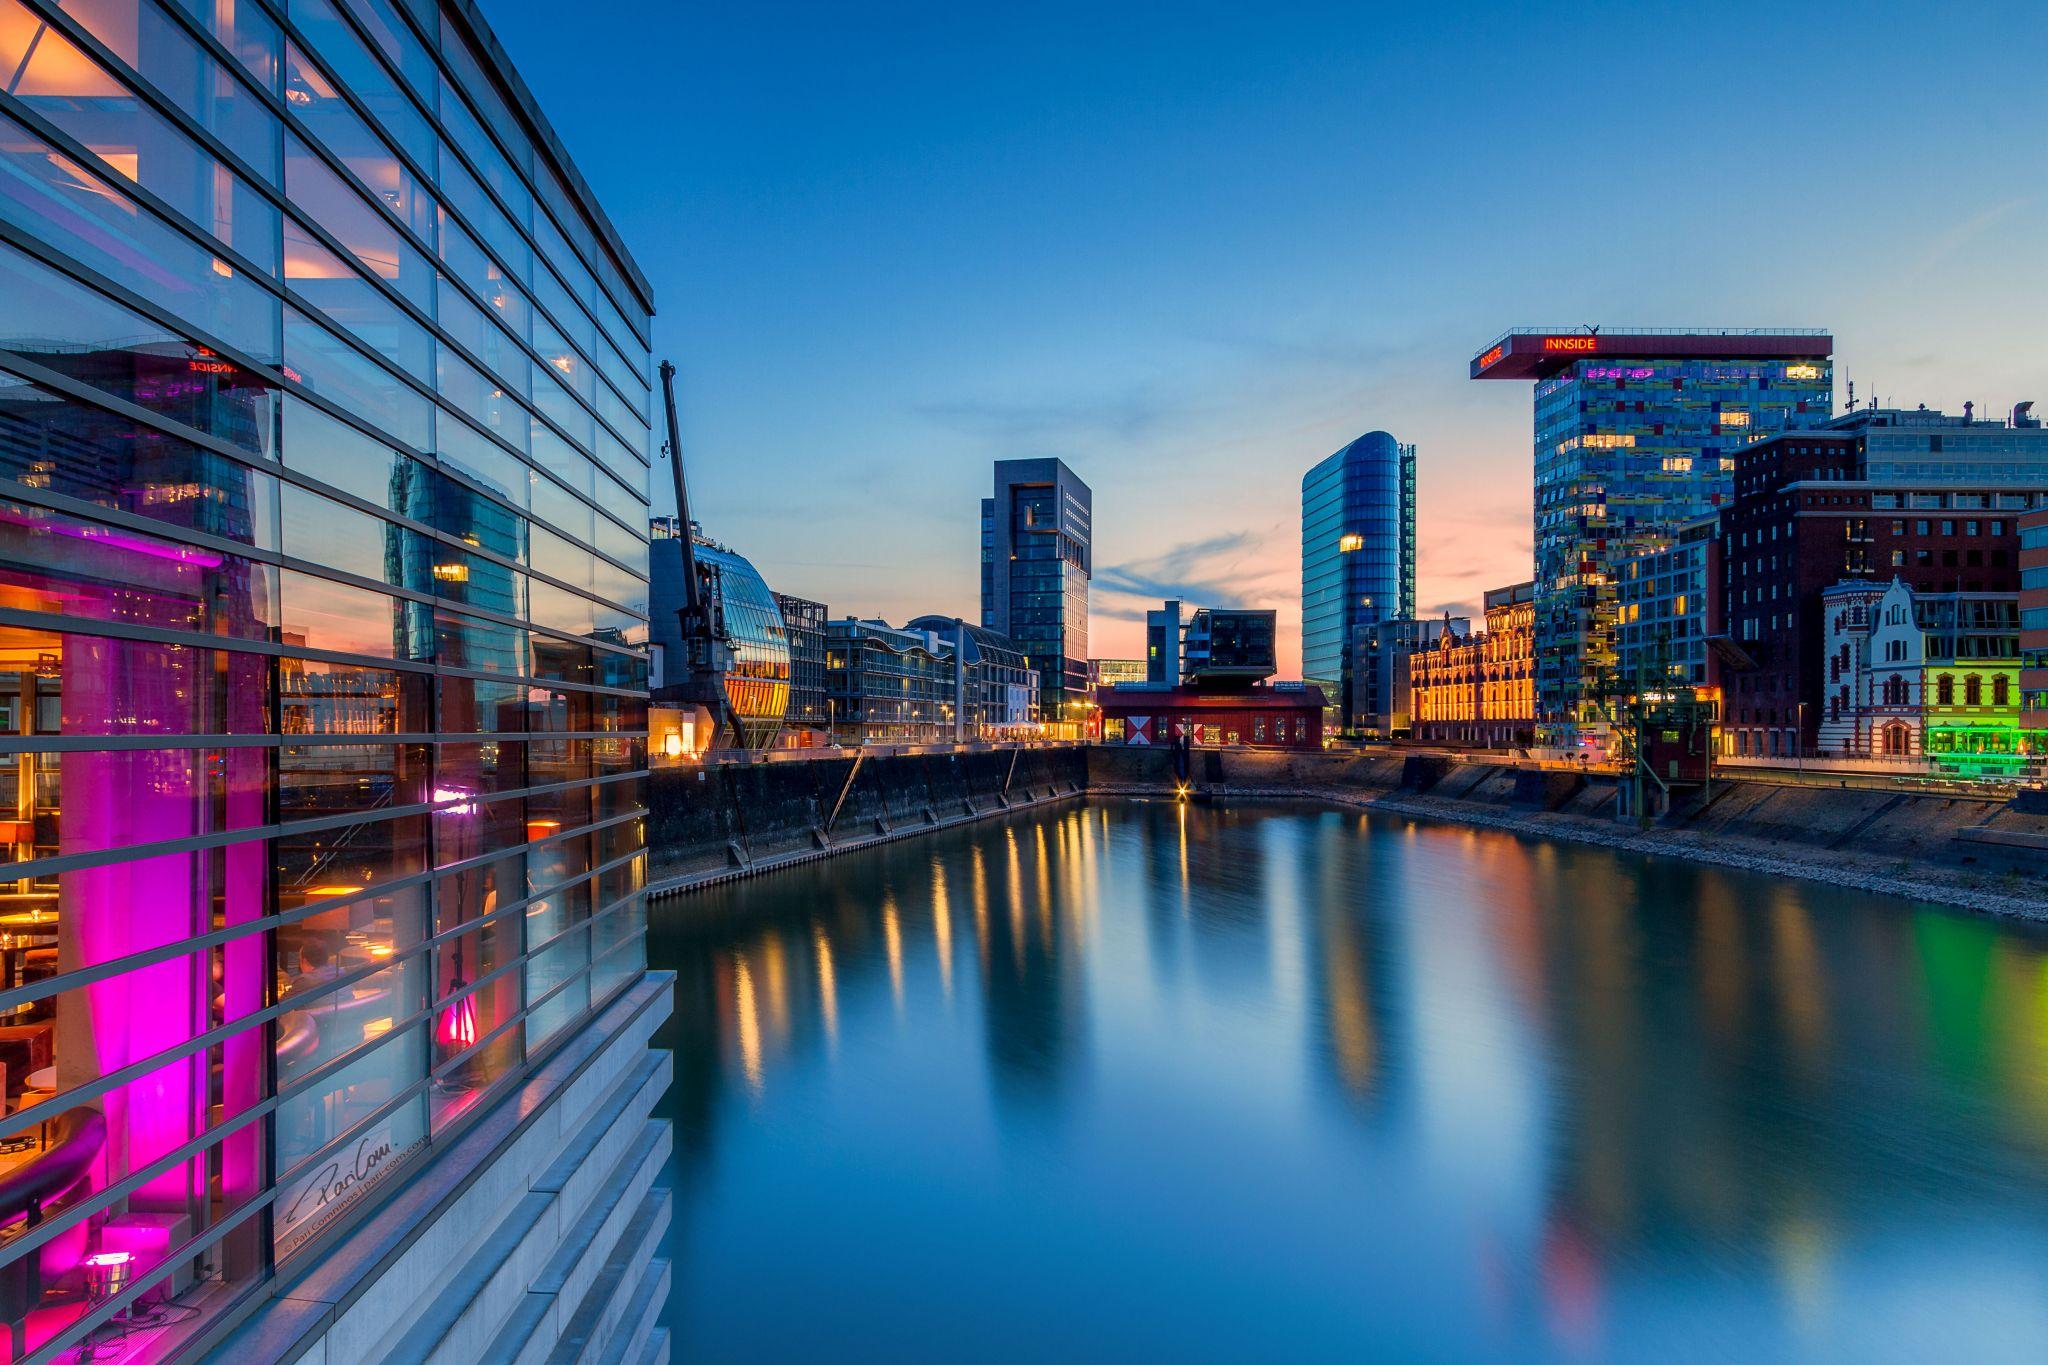 Mediahafen Düsseldorf, Germany